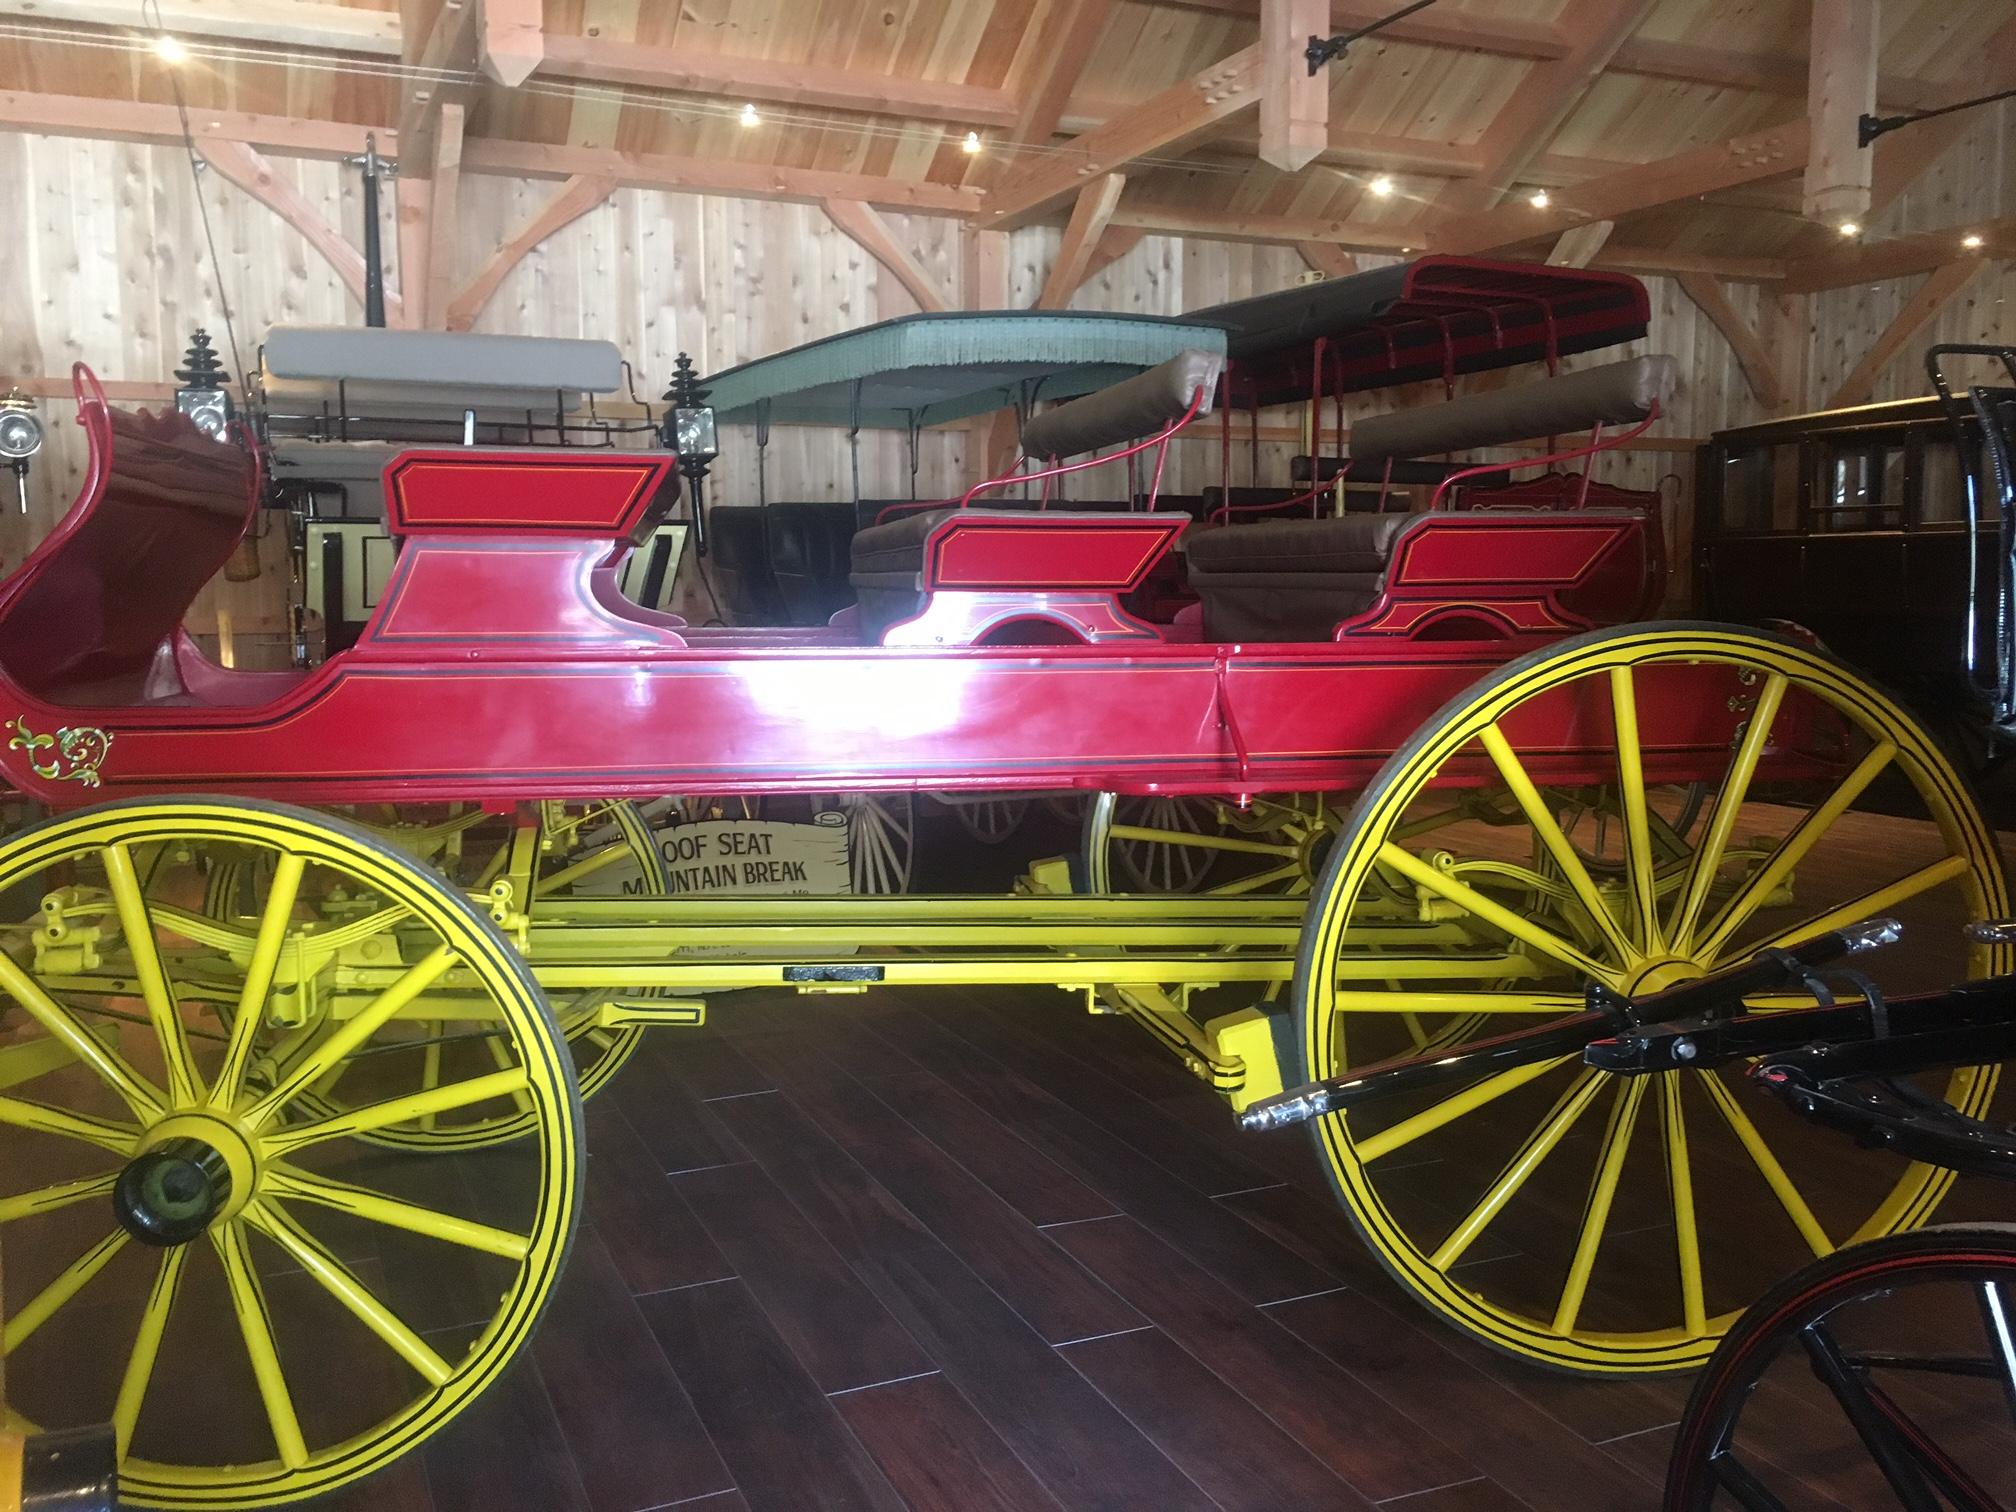 Drawn vehicle antique car COACHES New Current Auctions HORSE